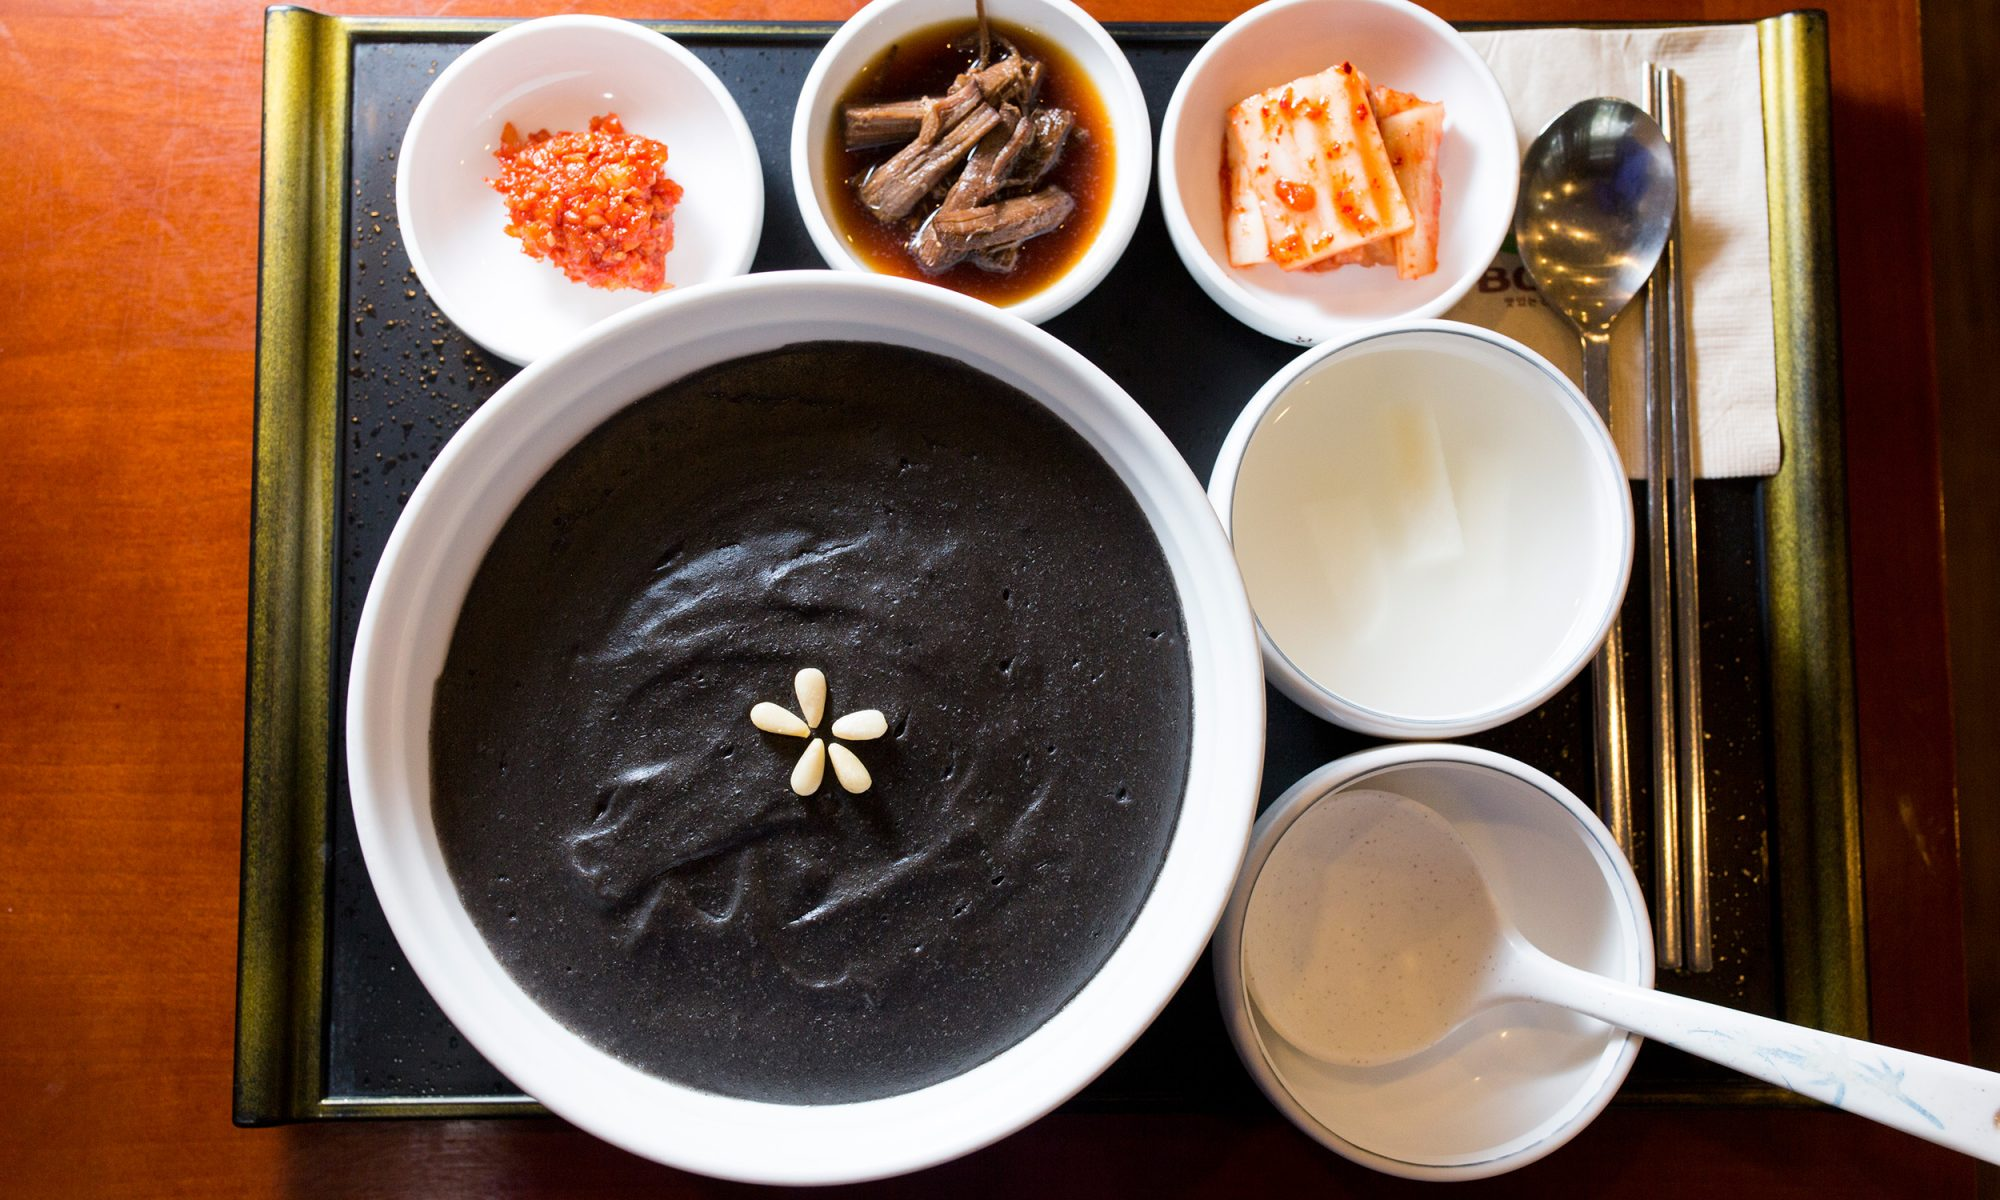 EC: Eat Korean Rice Porridge the Next Time You're Hungover